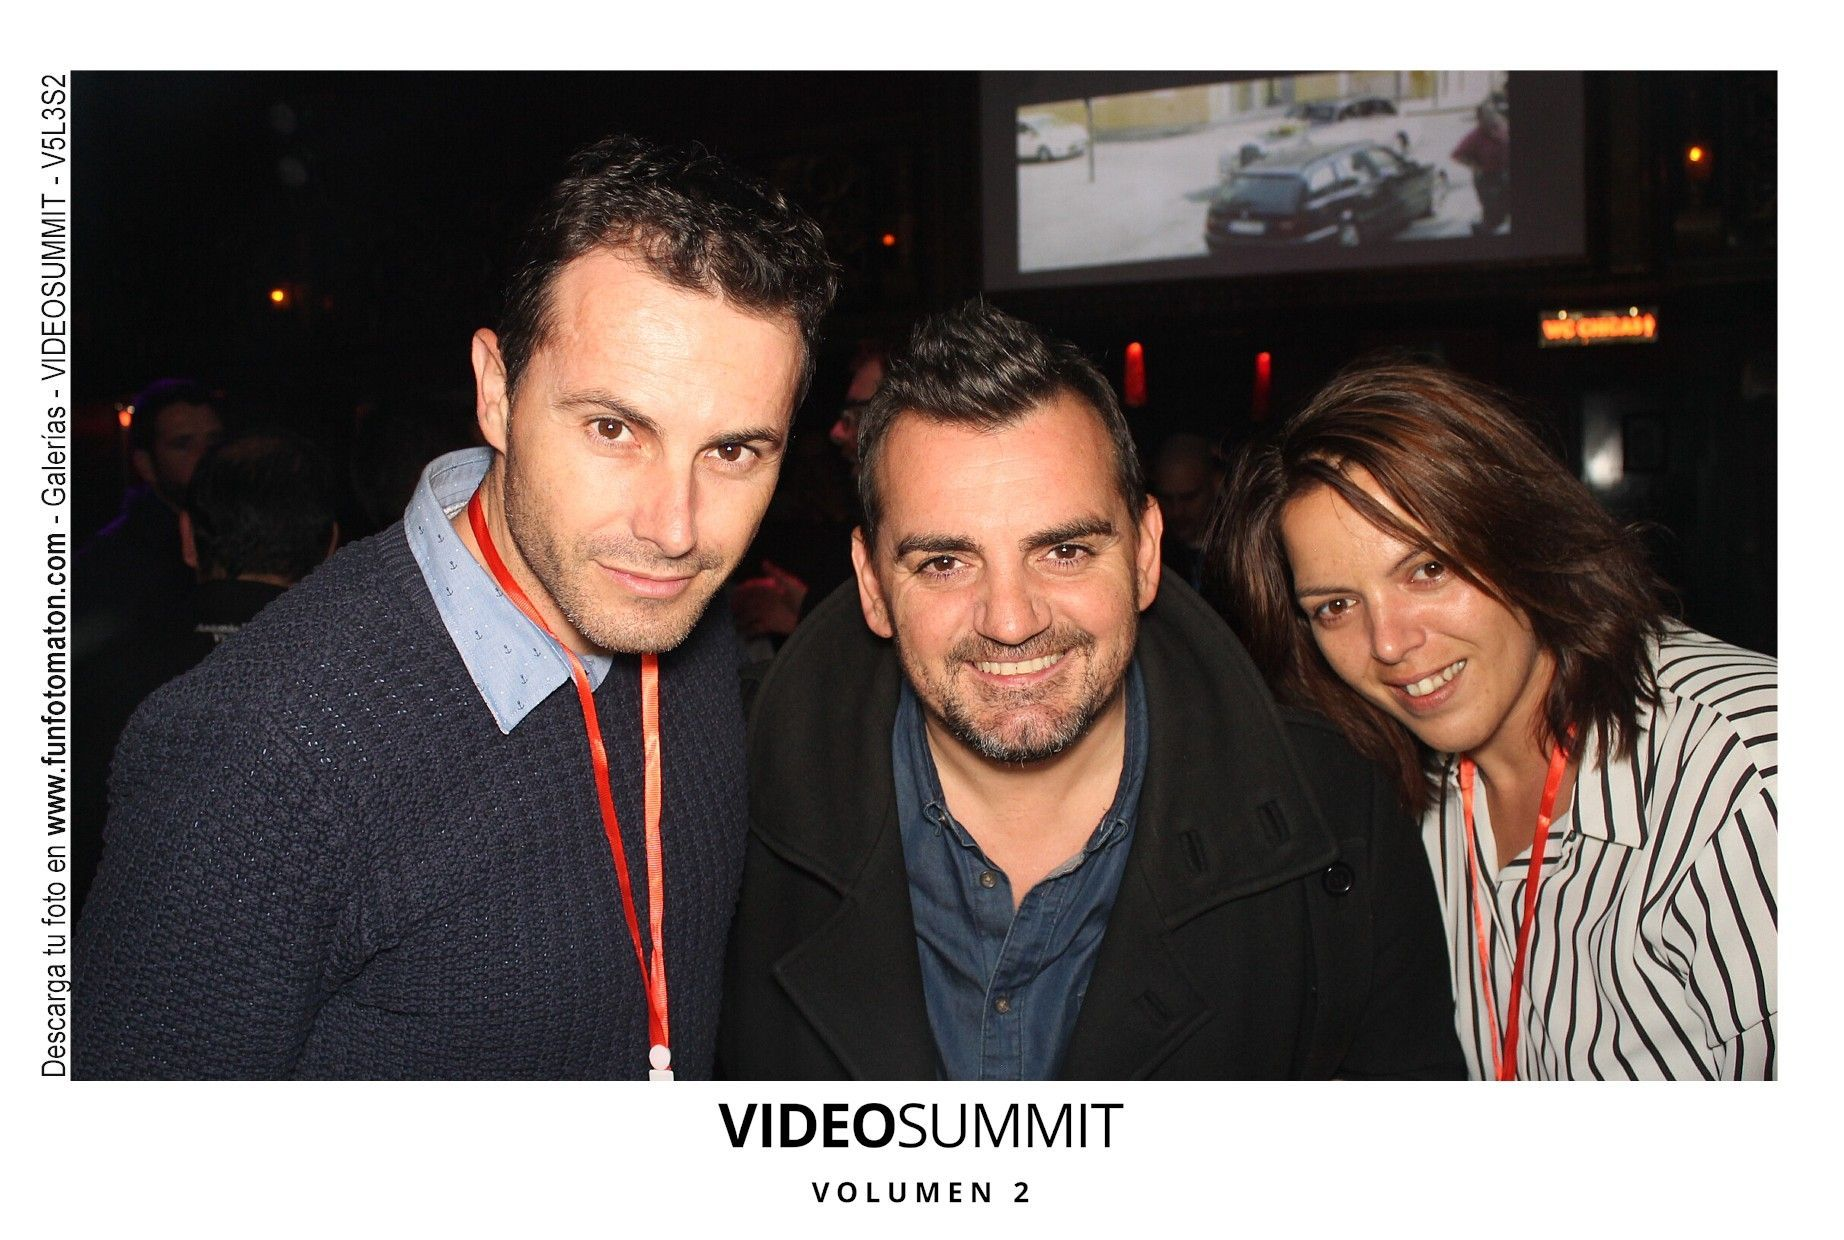 videosummit-vol2-club-party-035